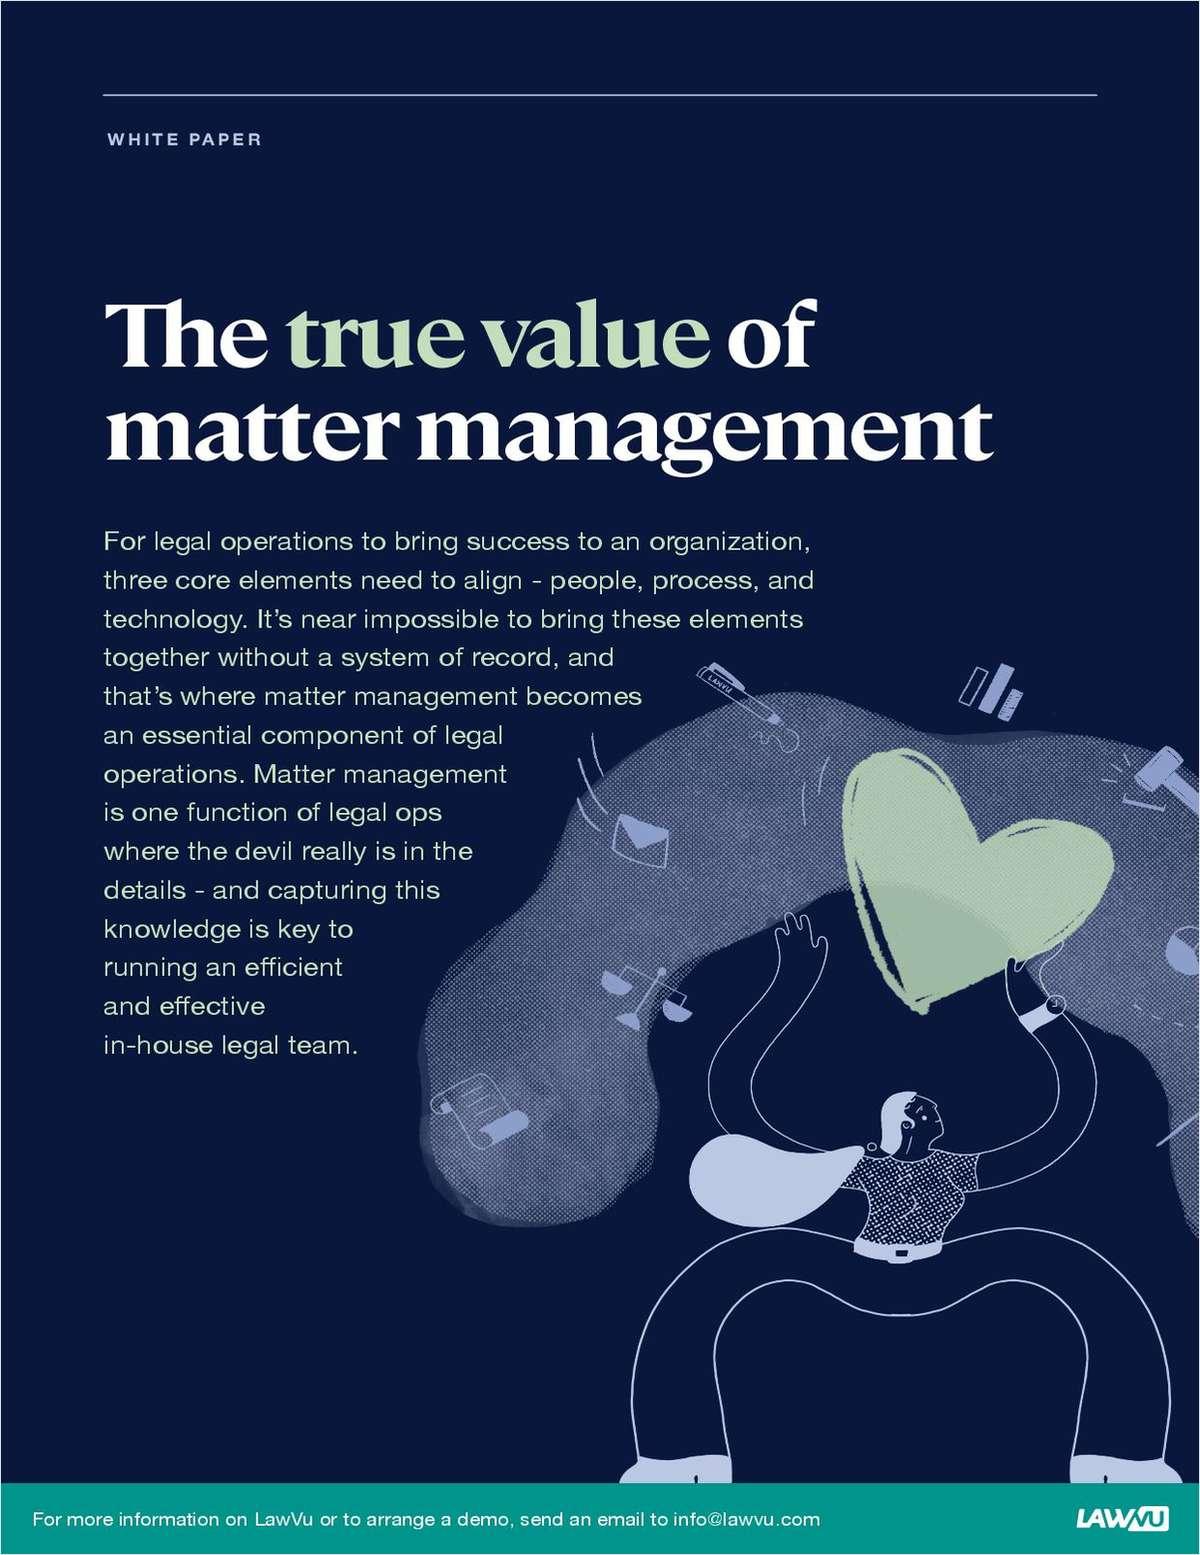 The True Value of Matter Management